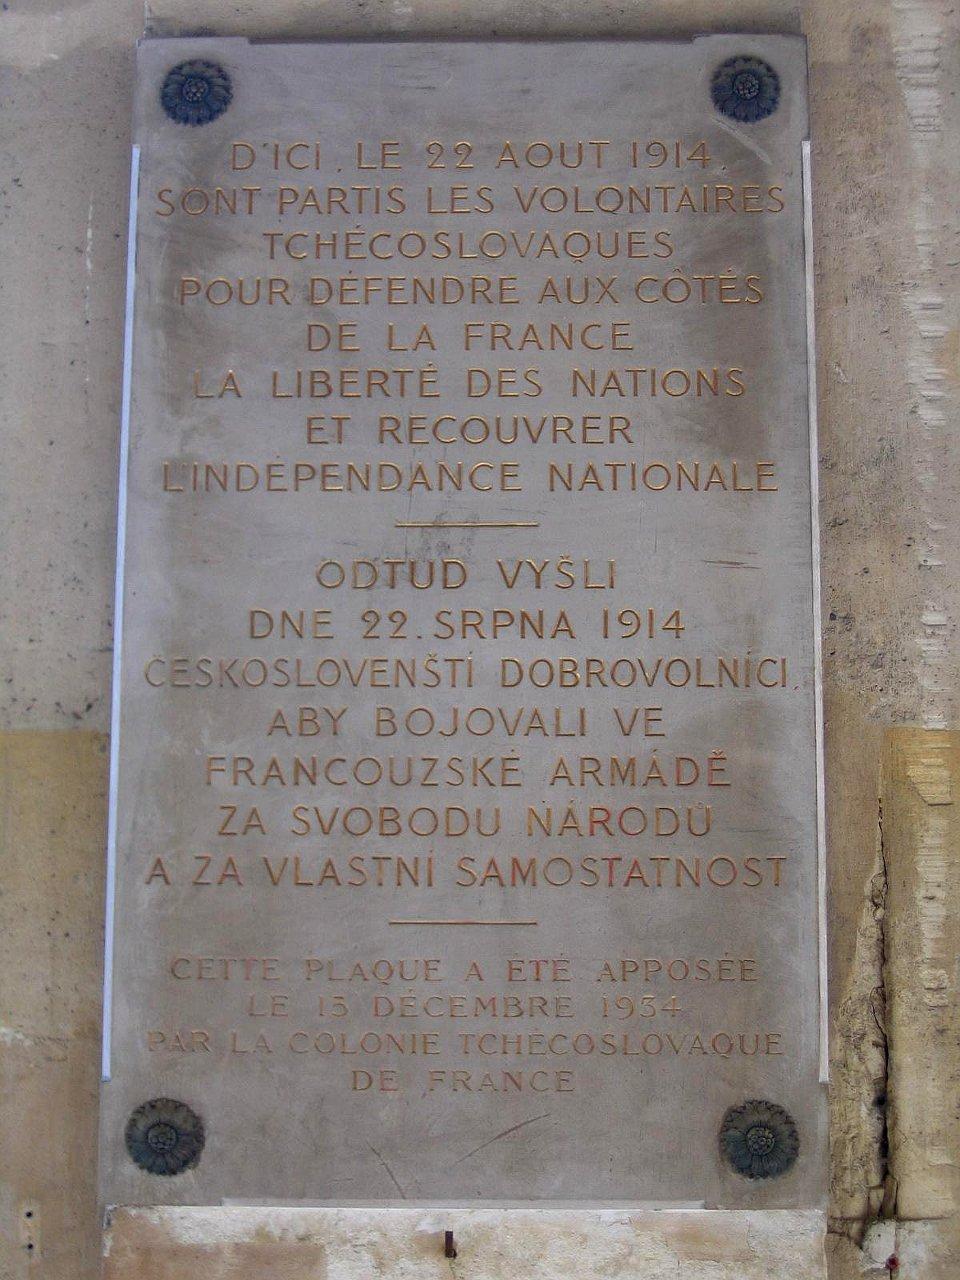 https://img.radio.cz/pictures/c/historie/1_sv_valka_cesi_francie/pametni_deska_palais_royal_1934.jpg